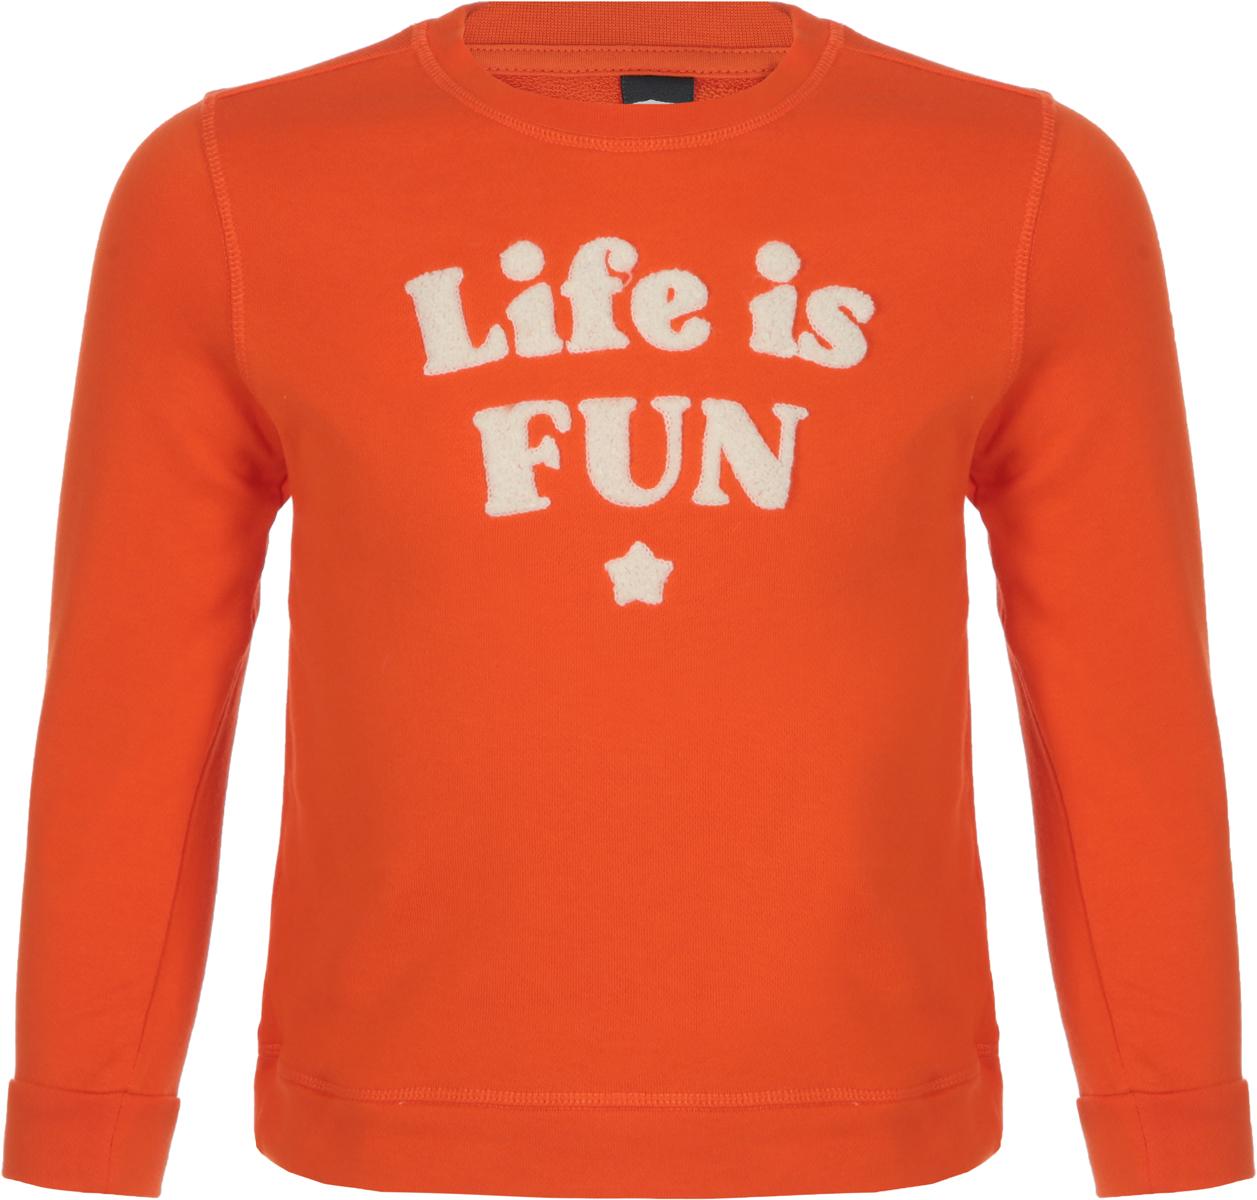 Джемпер для мальчика Sela, цвет: оранжевый. St-713/094-8112. Размер 116St-713/094-8112